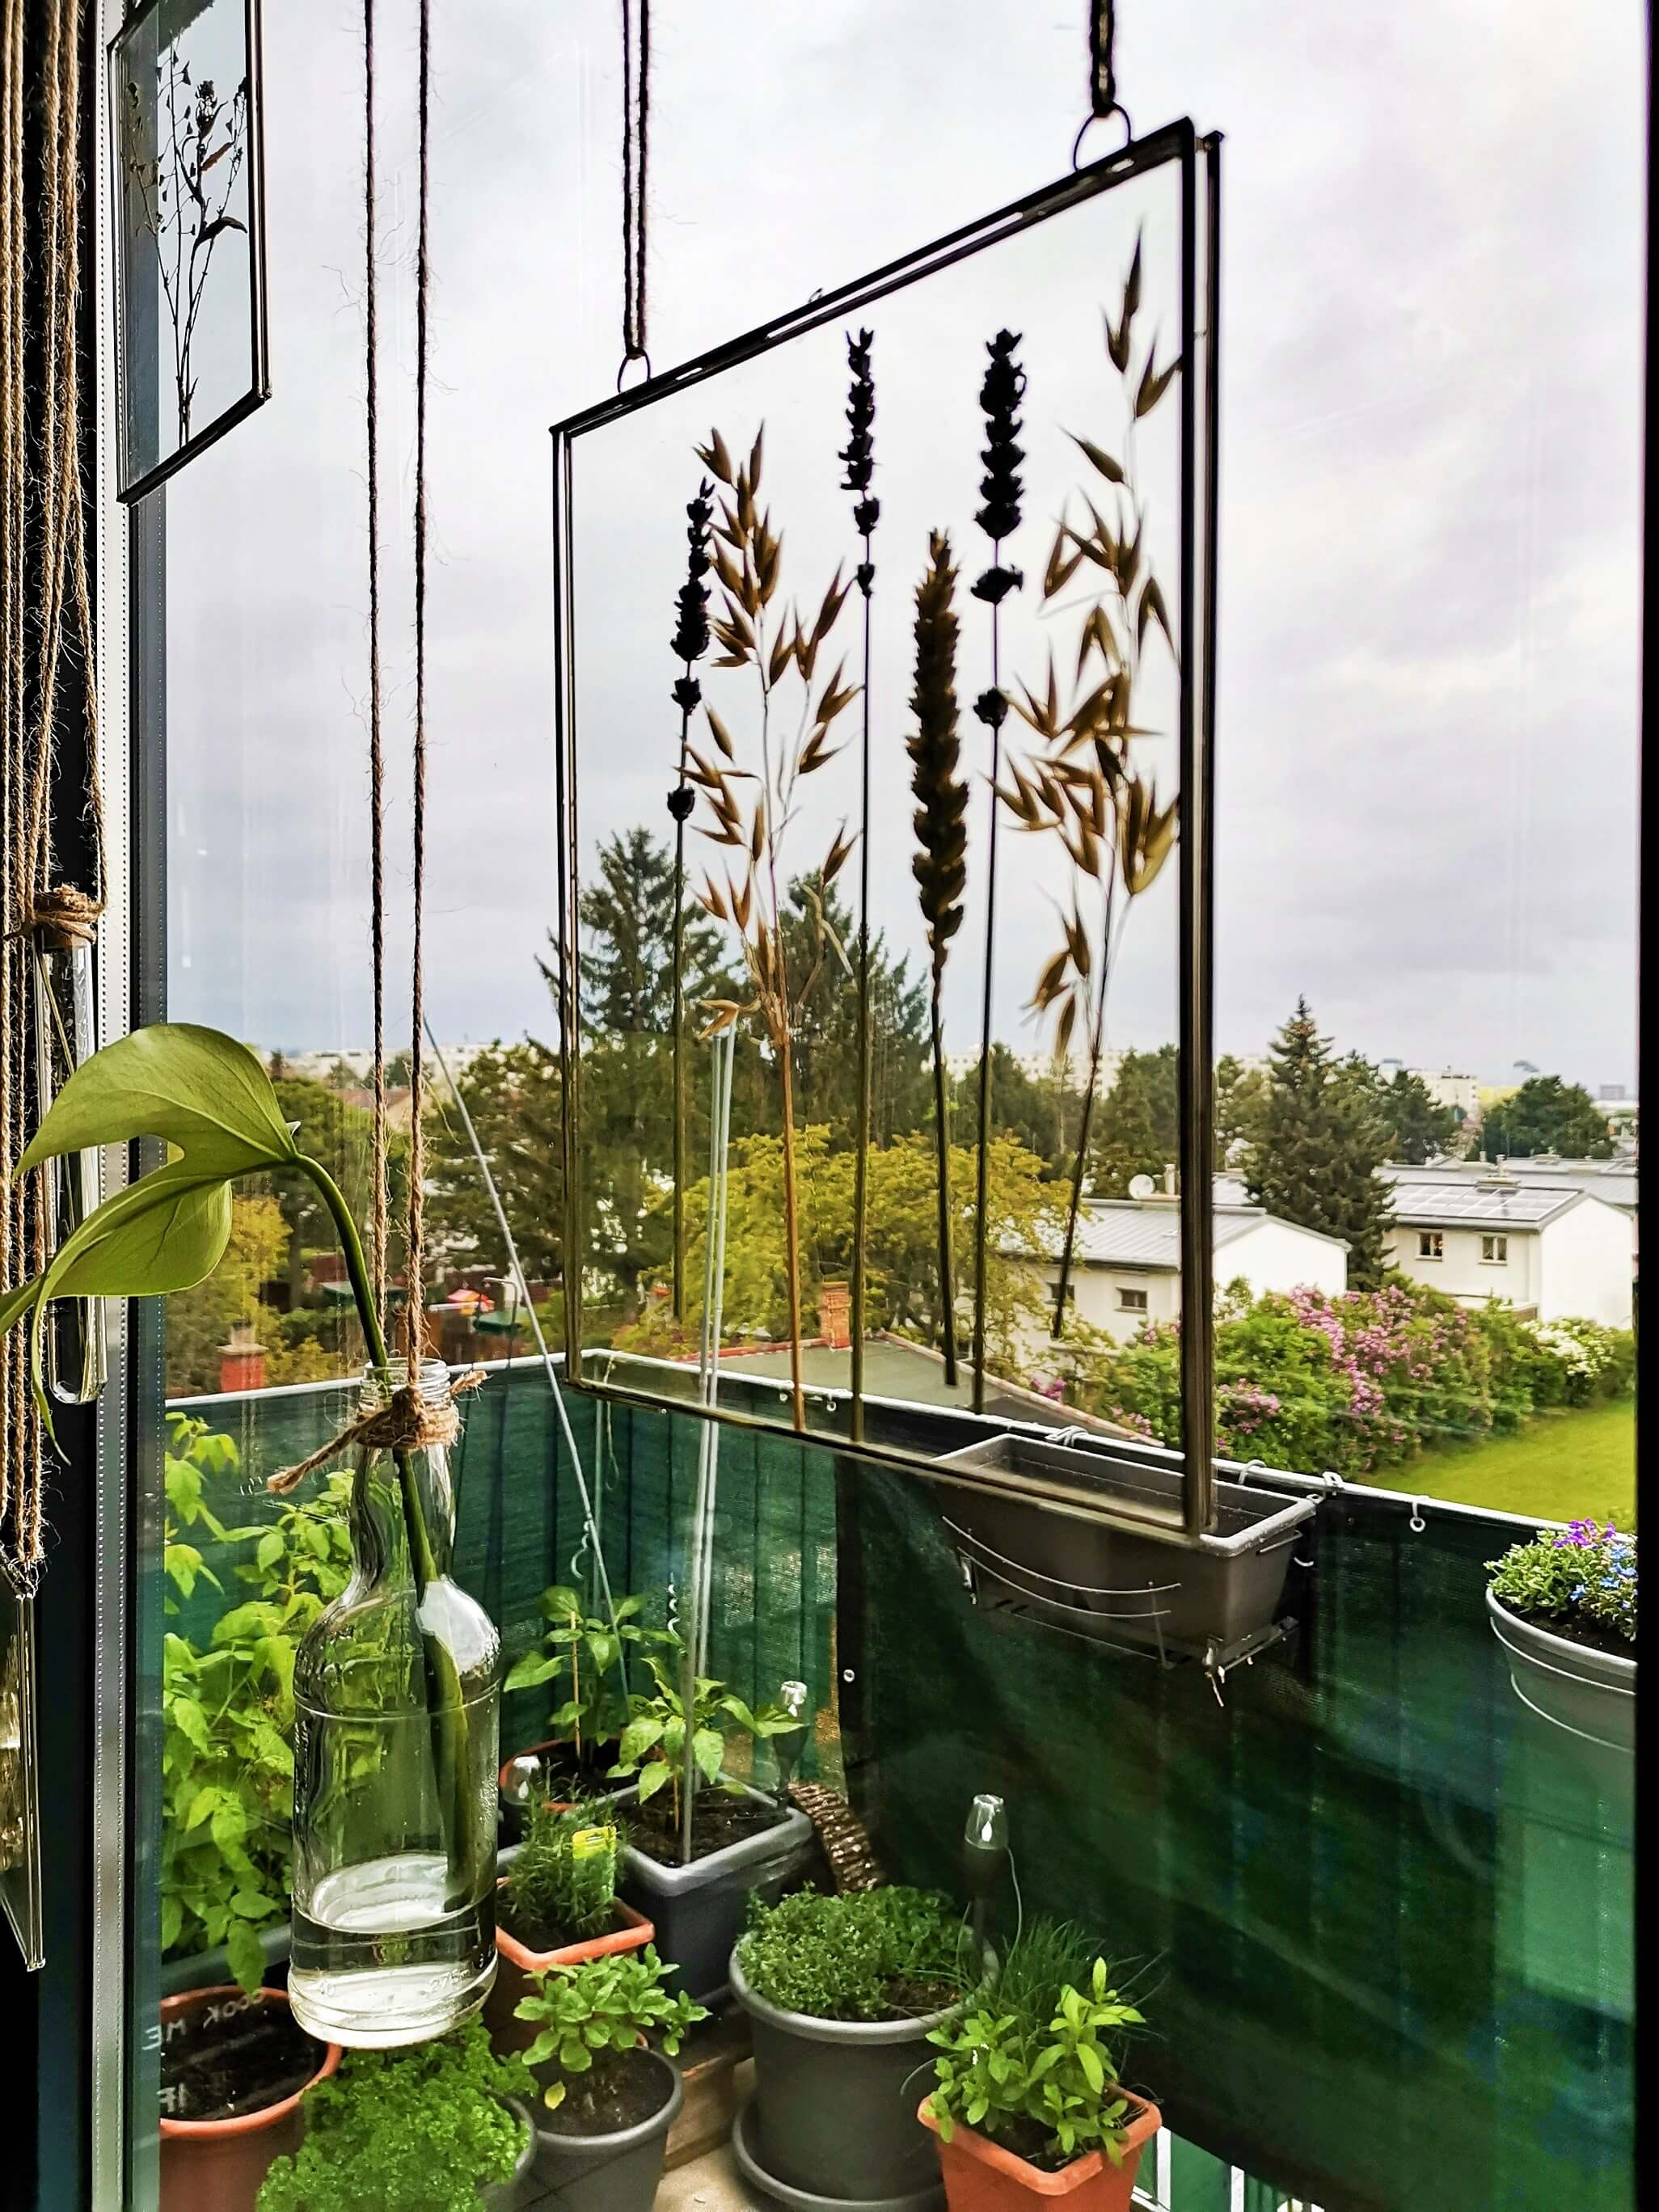 IMG 20190423 192009 01 resized 20190423 080441815 - Botanische Fensterdekoration: Herbarium statt Gardinen